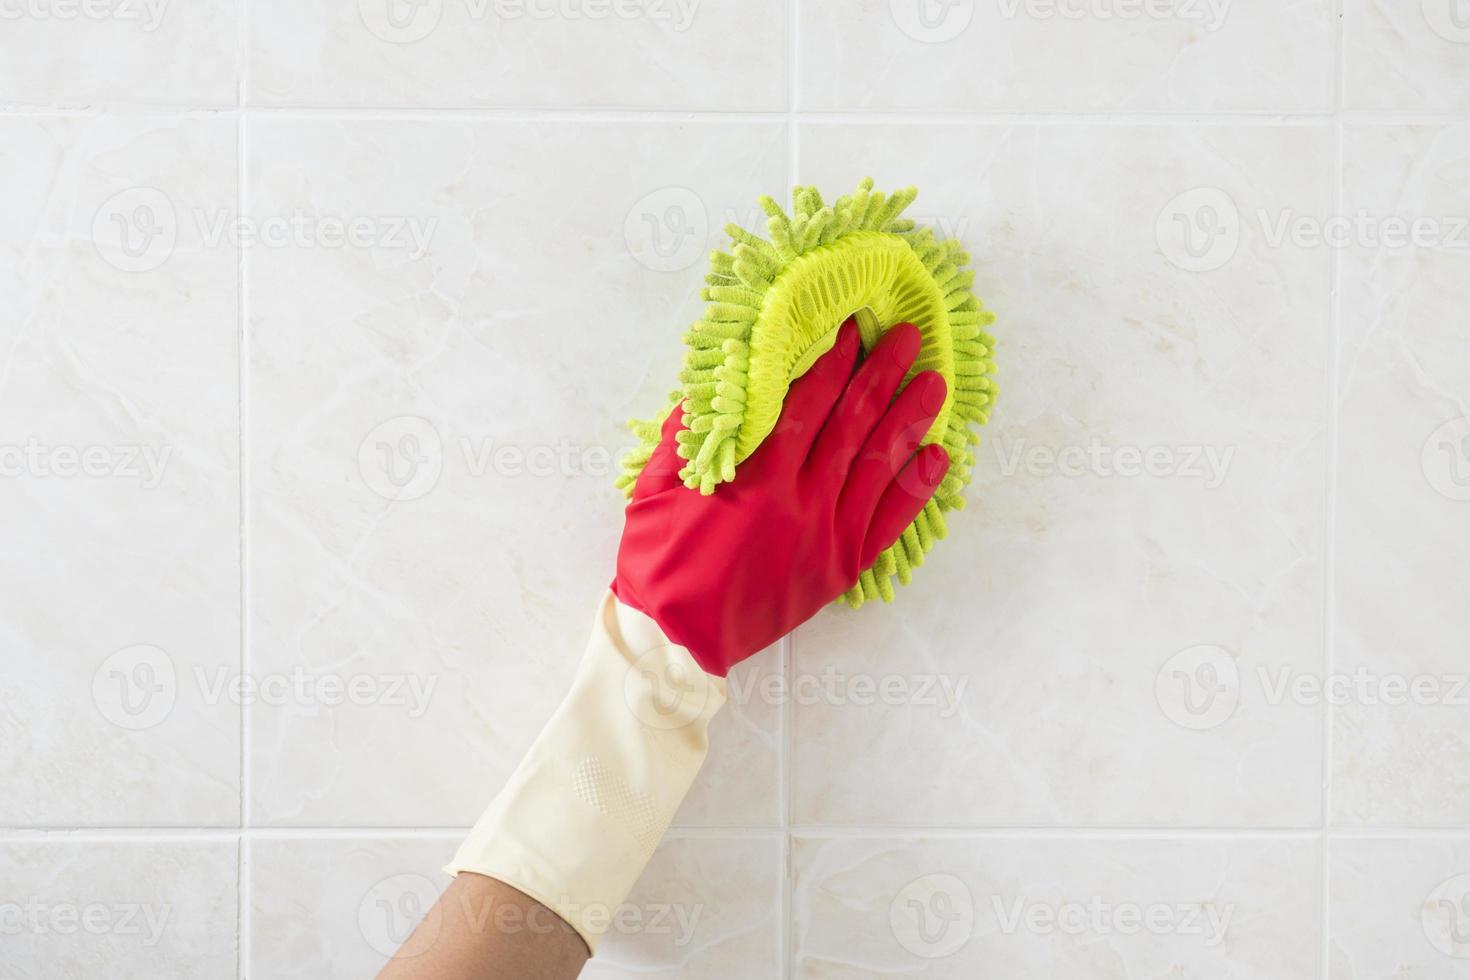 limpeza - limpar vidraça com detergente, conceito de limpeza de primavera foto